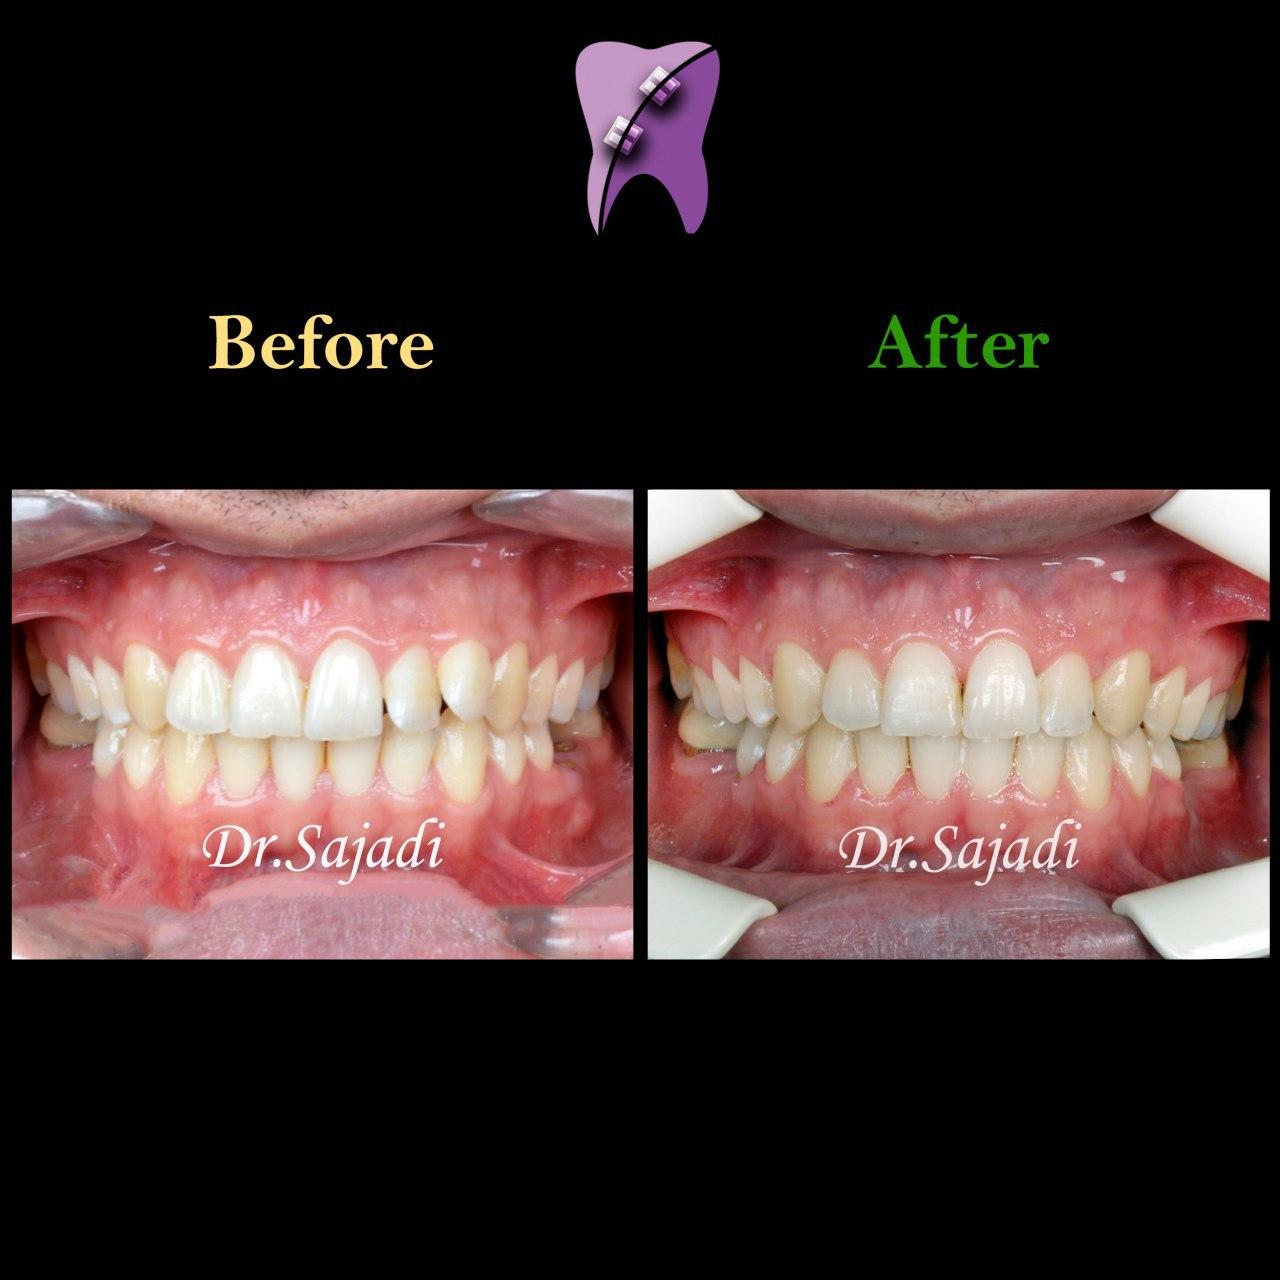 photo 2020 01 18 11 31 17 - درمان ارتودنسي بيمار با داشتن يك دندان اضافه در فك بالا